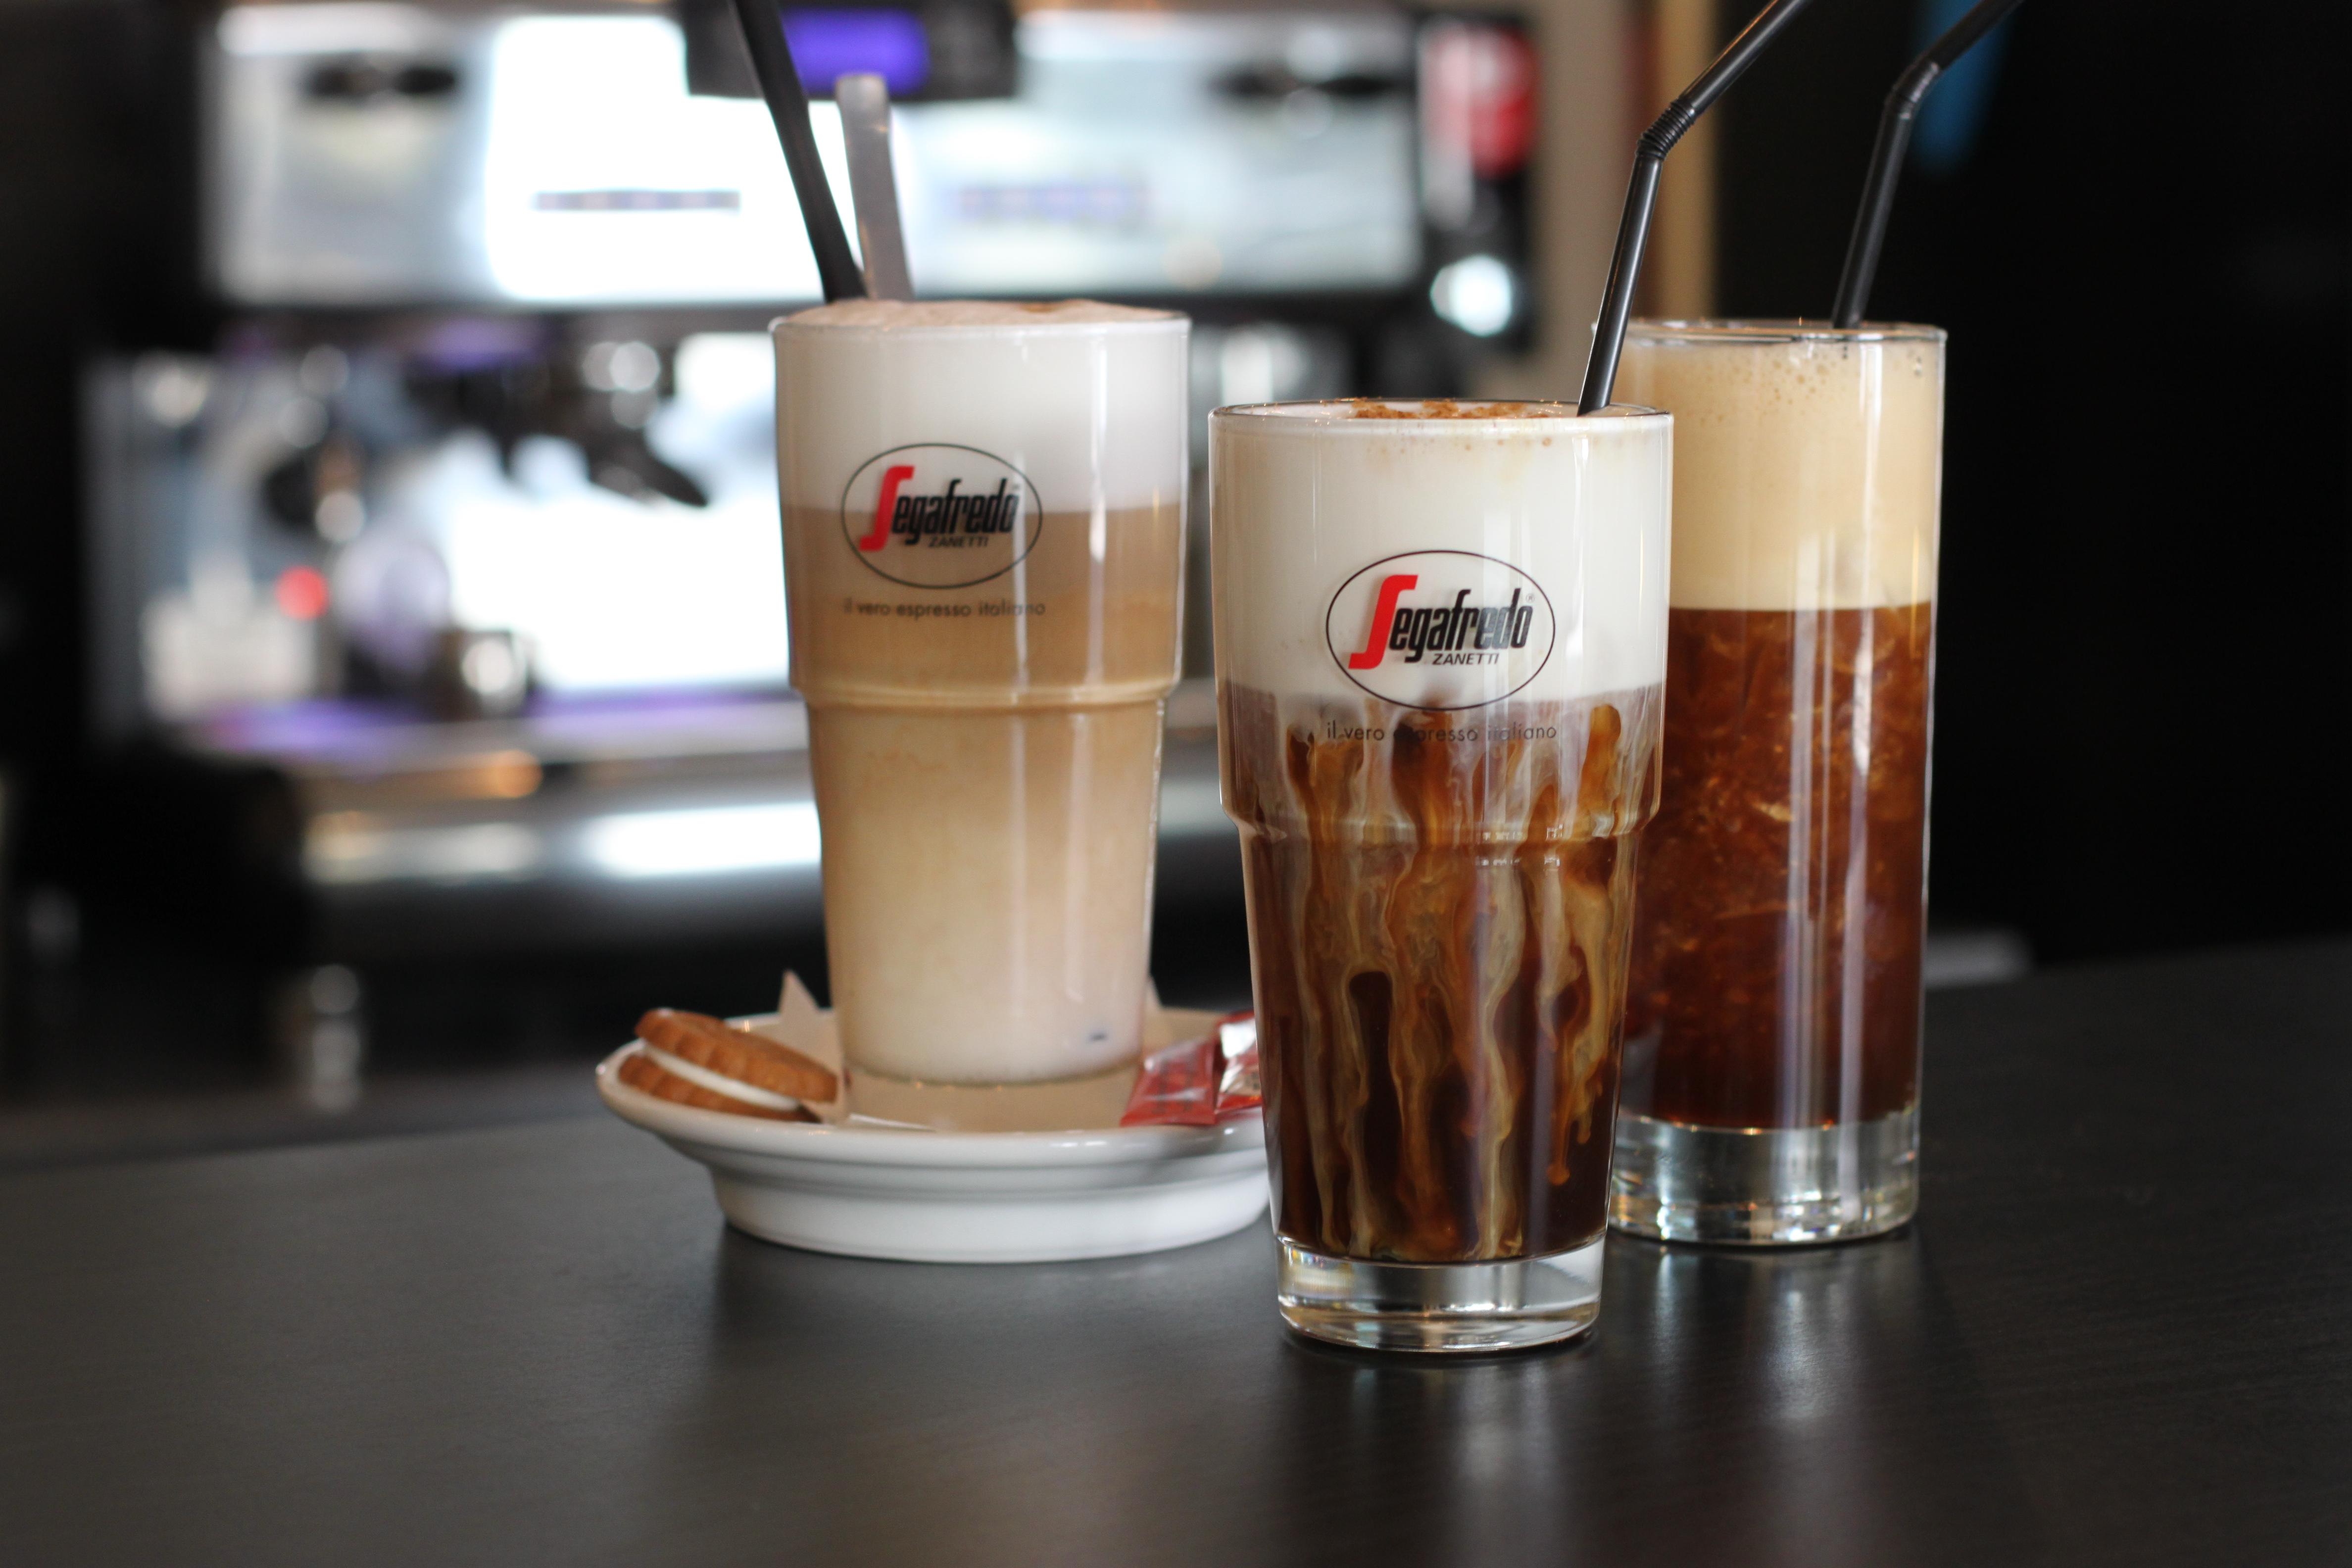 Cafe Royal 70736 Fellbach Schmiden öffnungszeiten Adresse Telefon